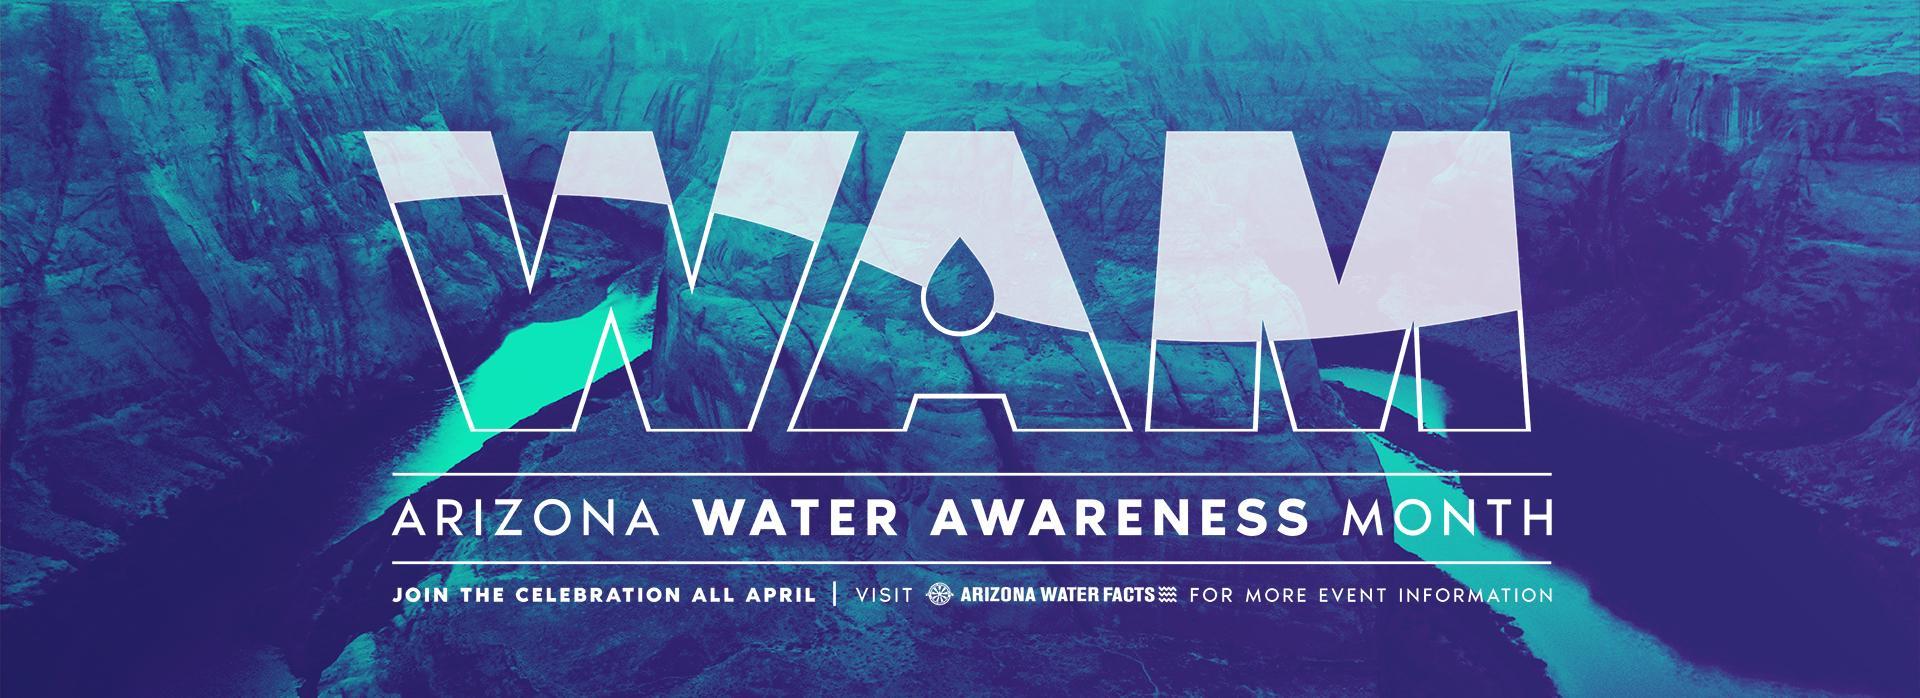 Water Awareness Month